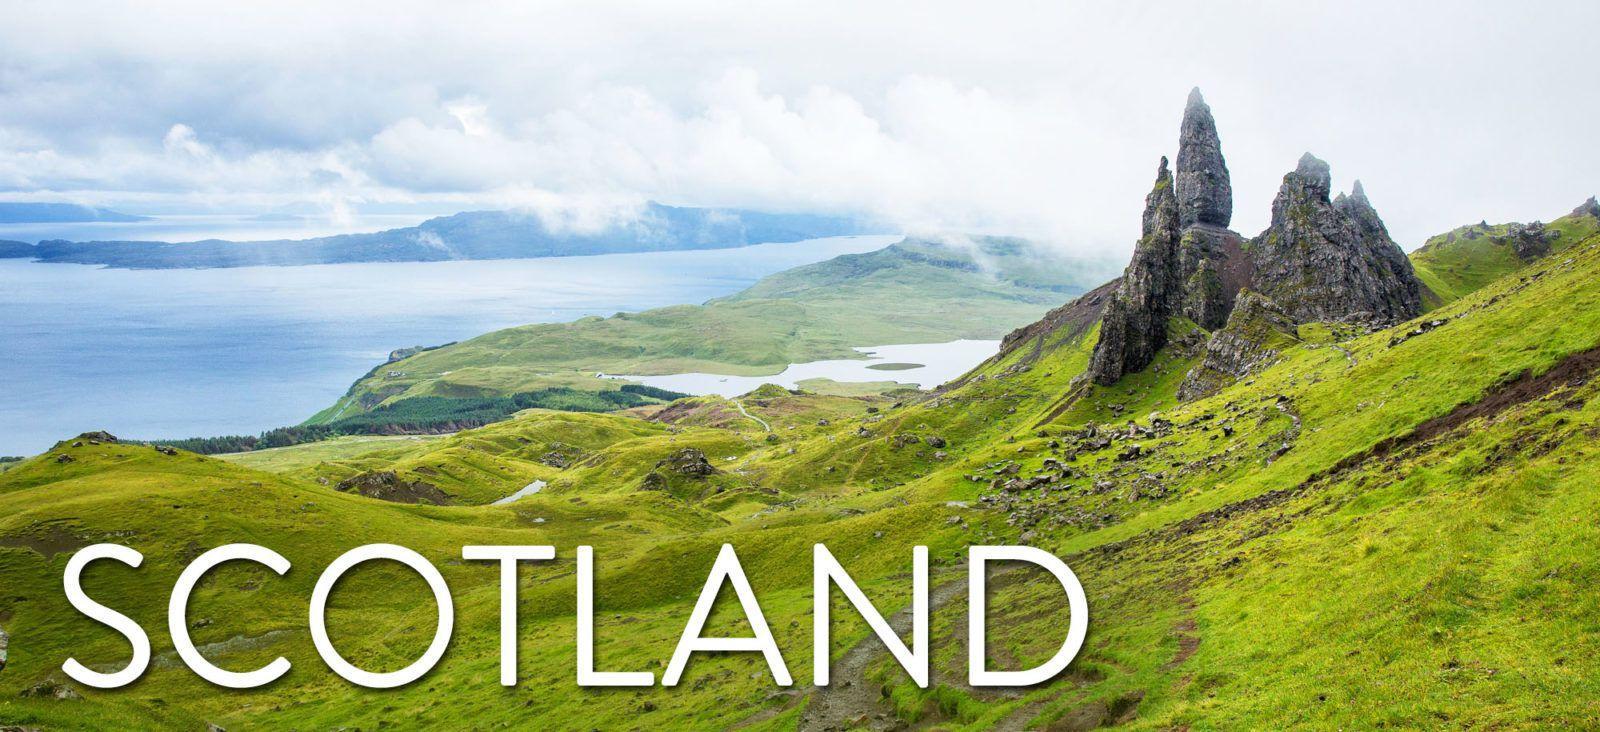 https://s27363.pcdn.co/wp-content/uploads/2021/01/Scotland-Photo-1600x732.jpg.optimal.jpg